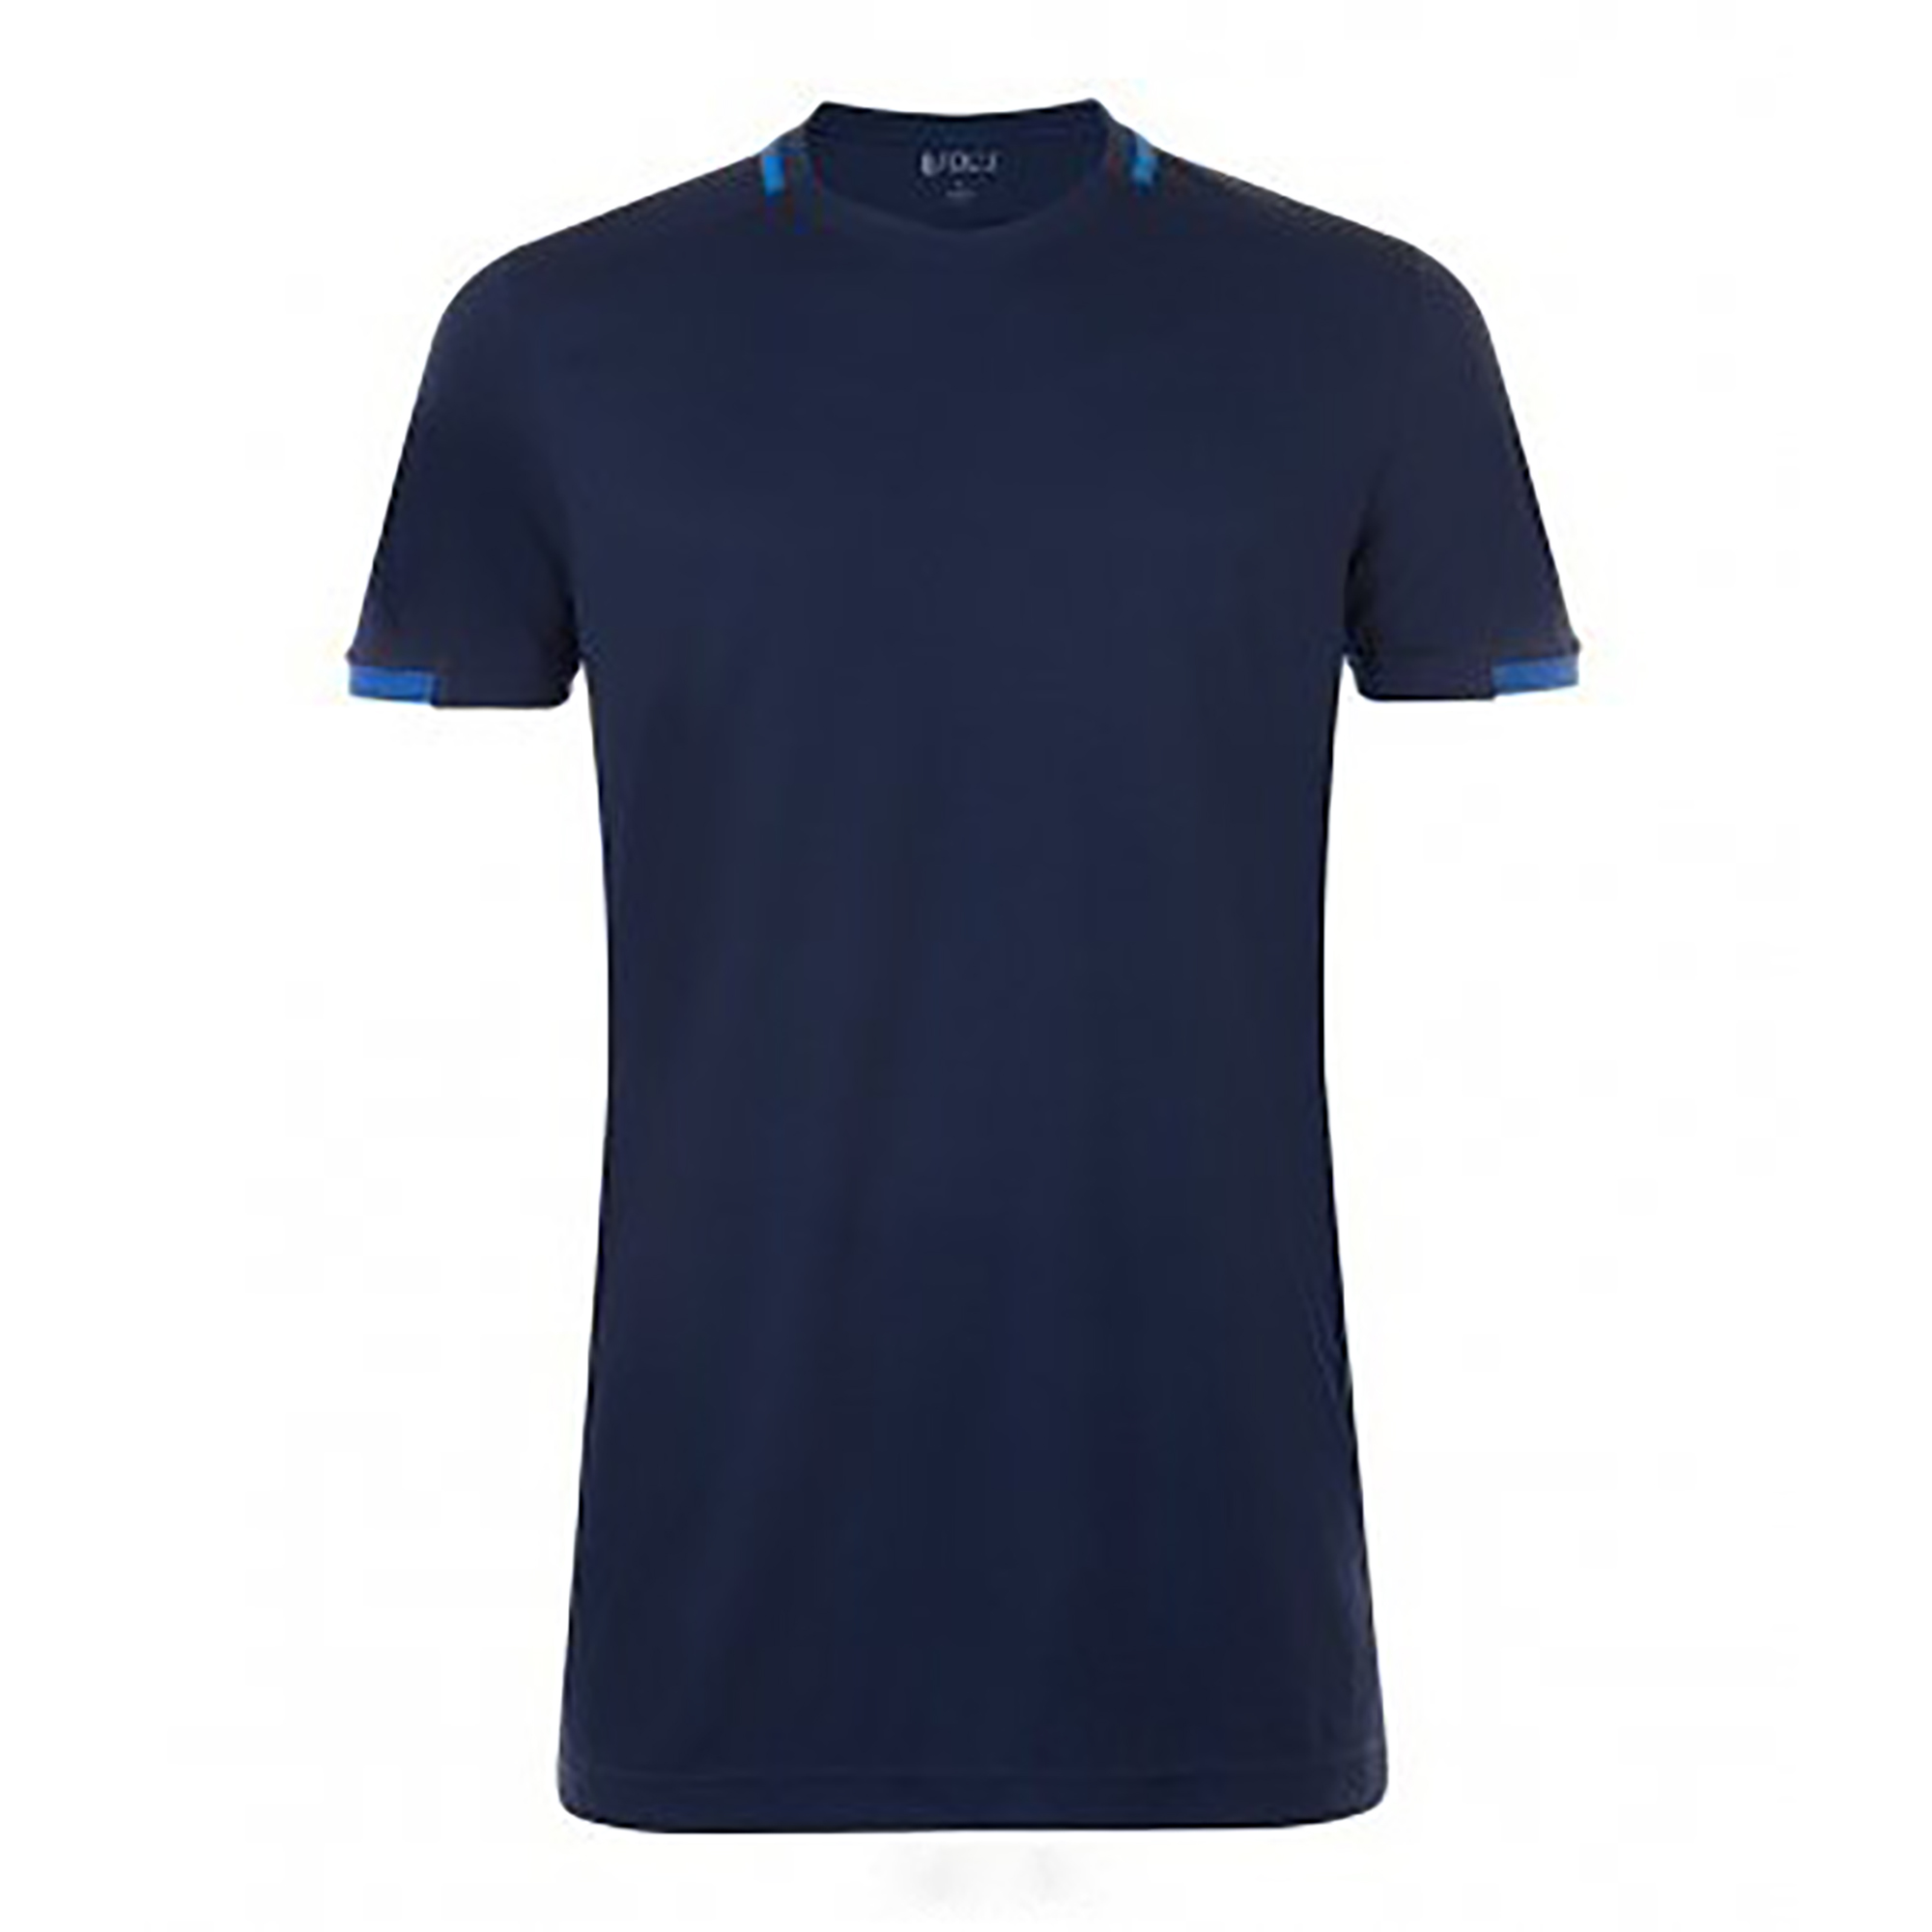 SOLS Mens Classico Contrast Short Sleeve Football T-Shirt (XS) (French Navy/Royal Blue)